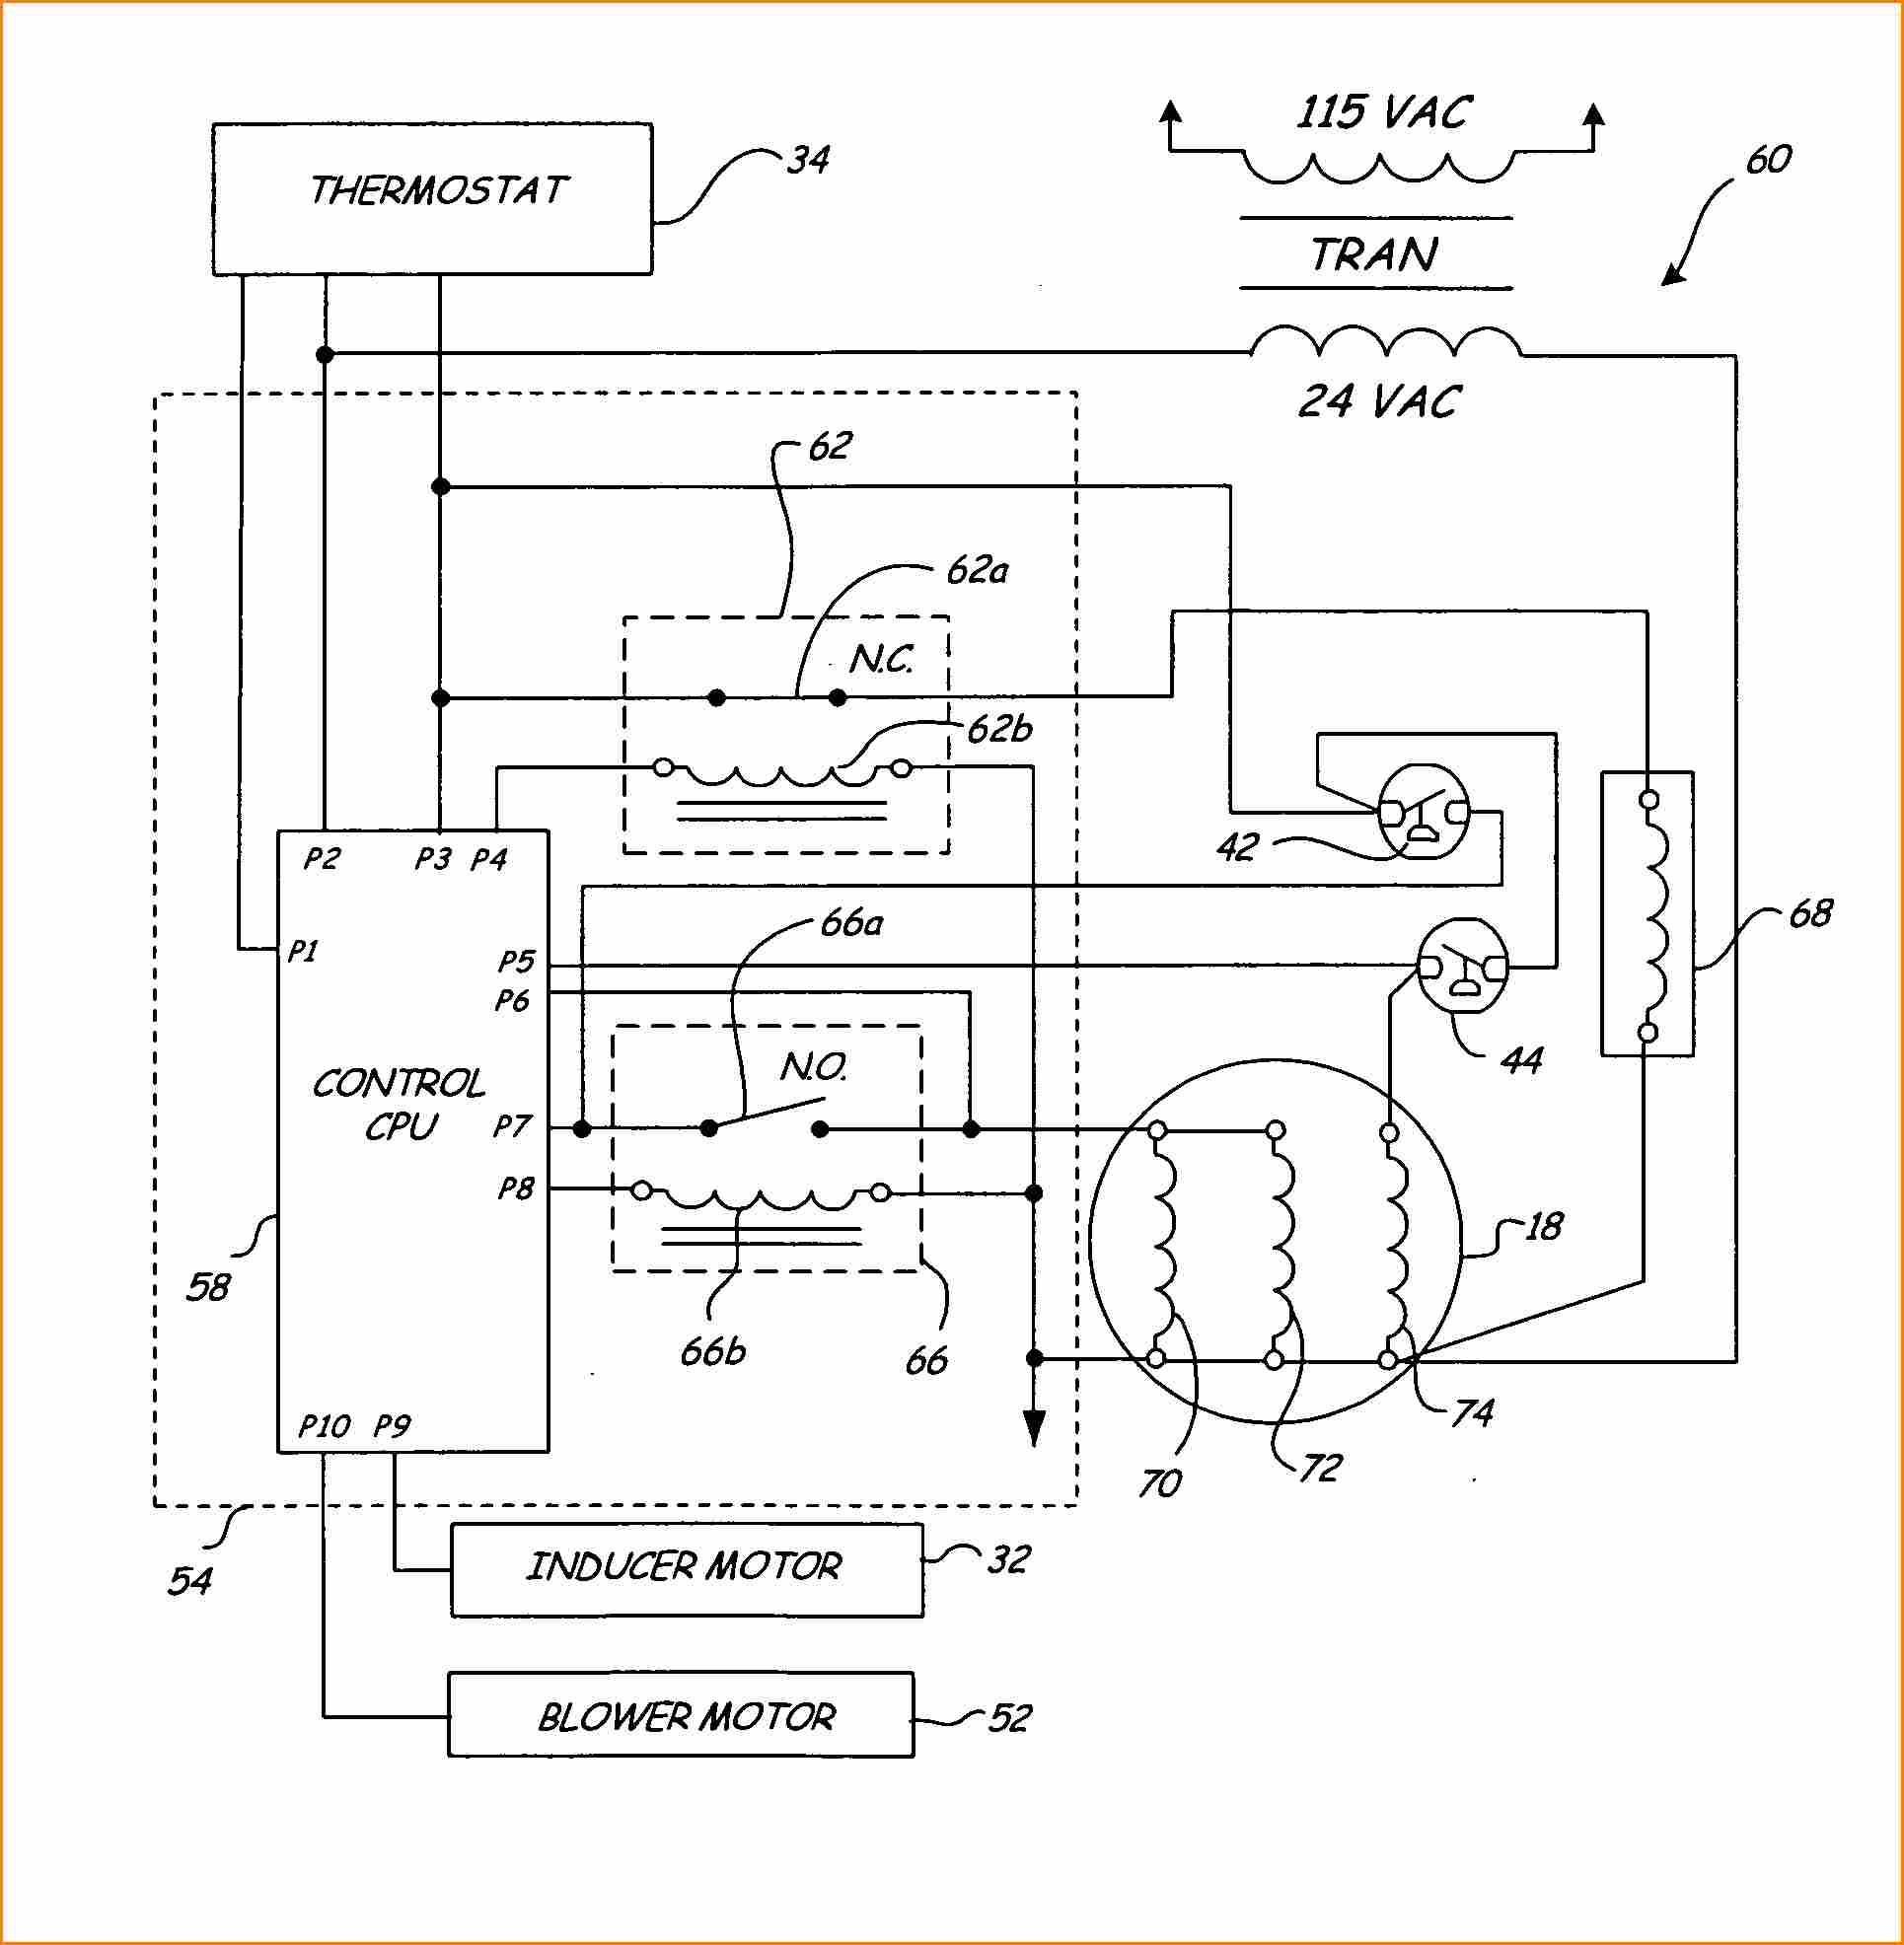 hight resolution of modine wiring diagram wiring diagrams modine pa heater wiring diagram